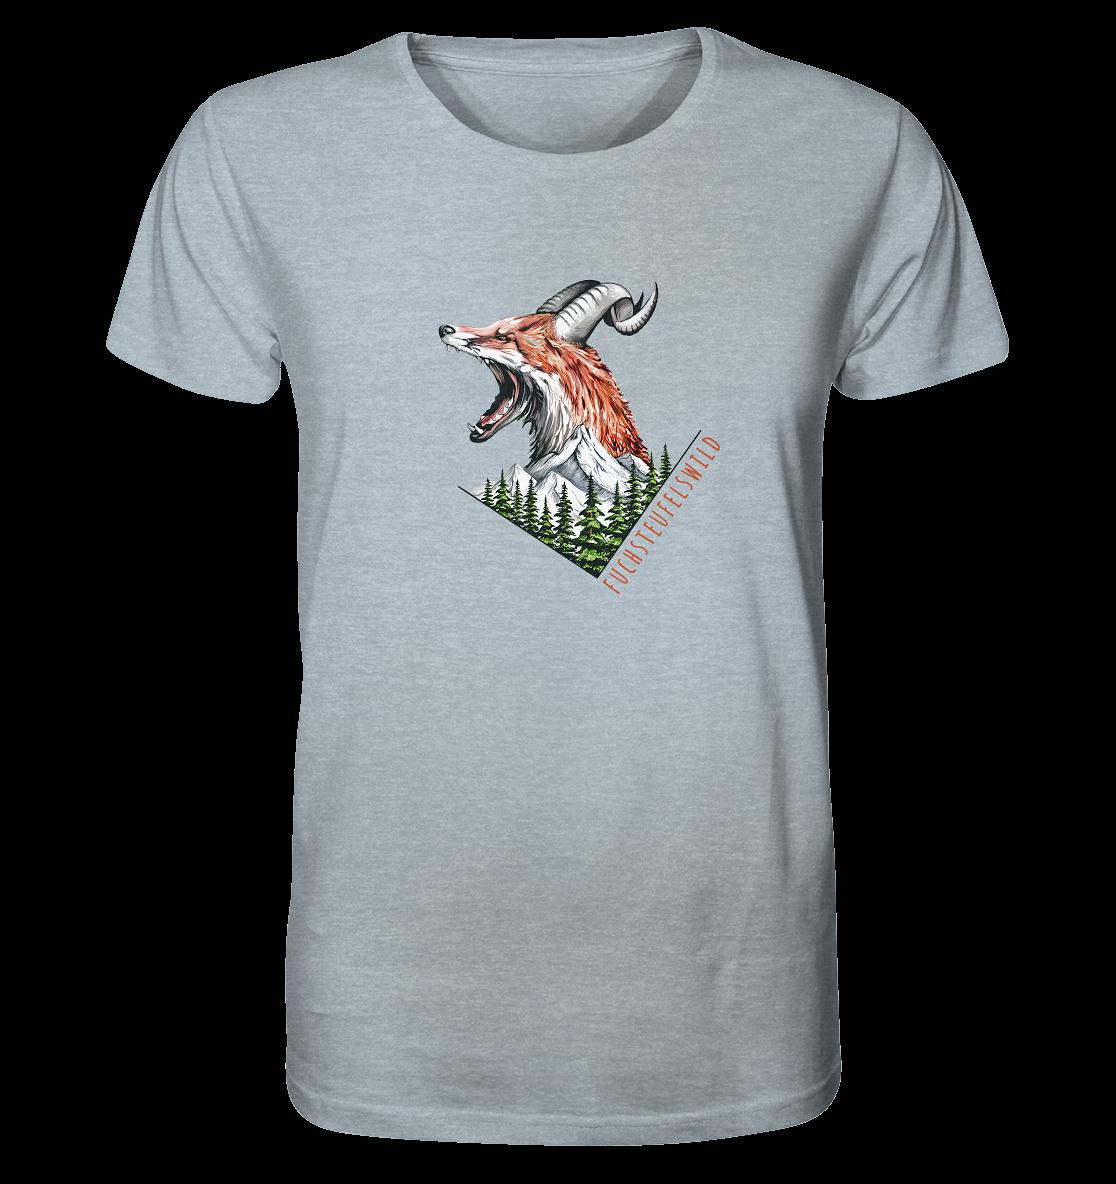 front-organic-shirt-meliert-adbfcb-1116x-1.png